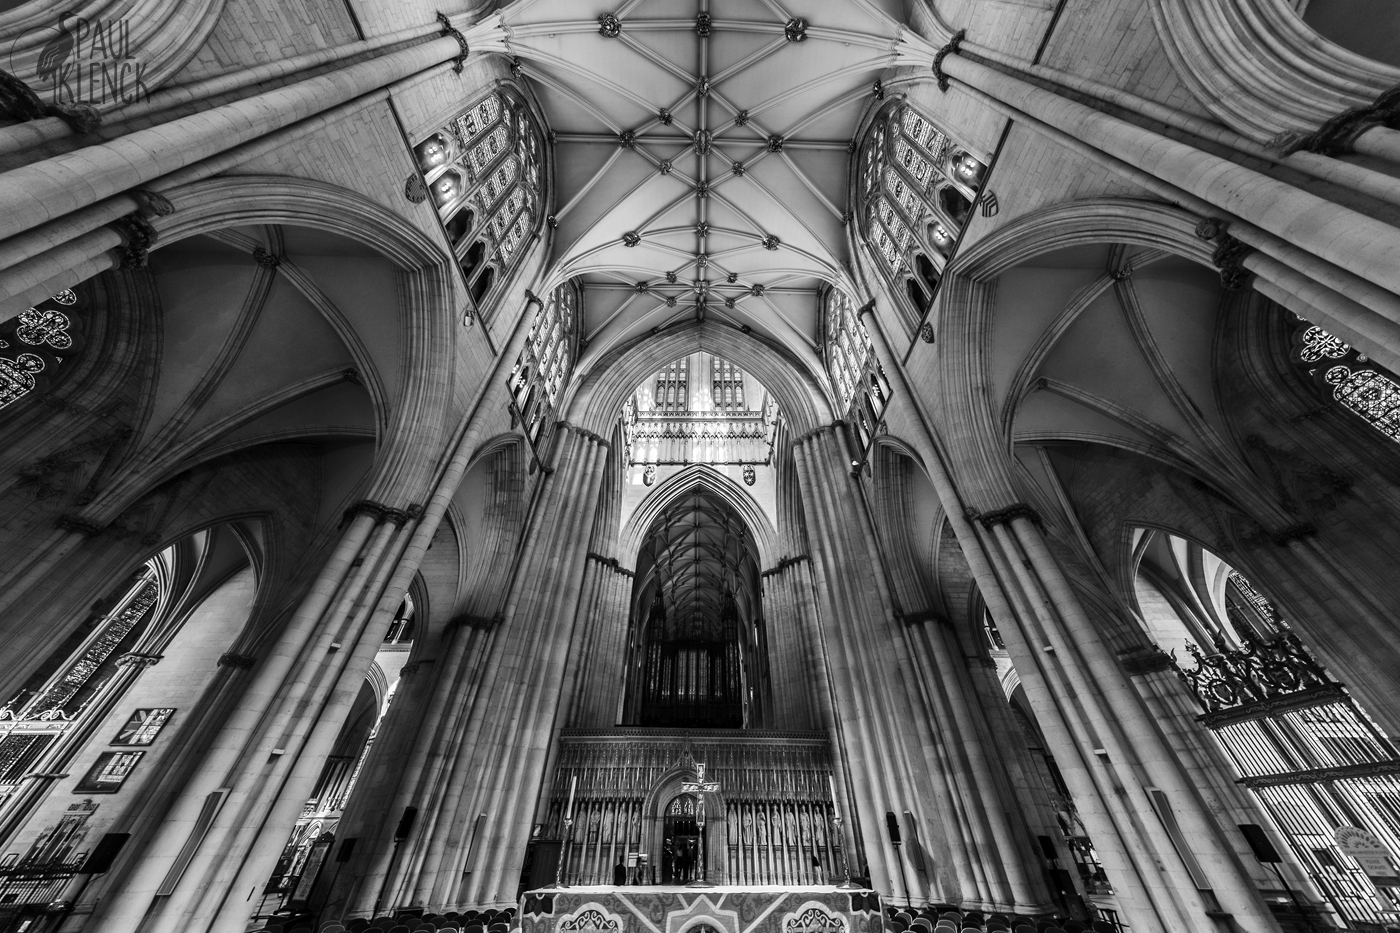 Main altar looking to the choir